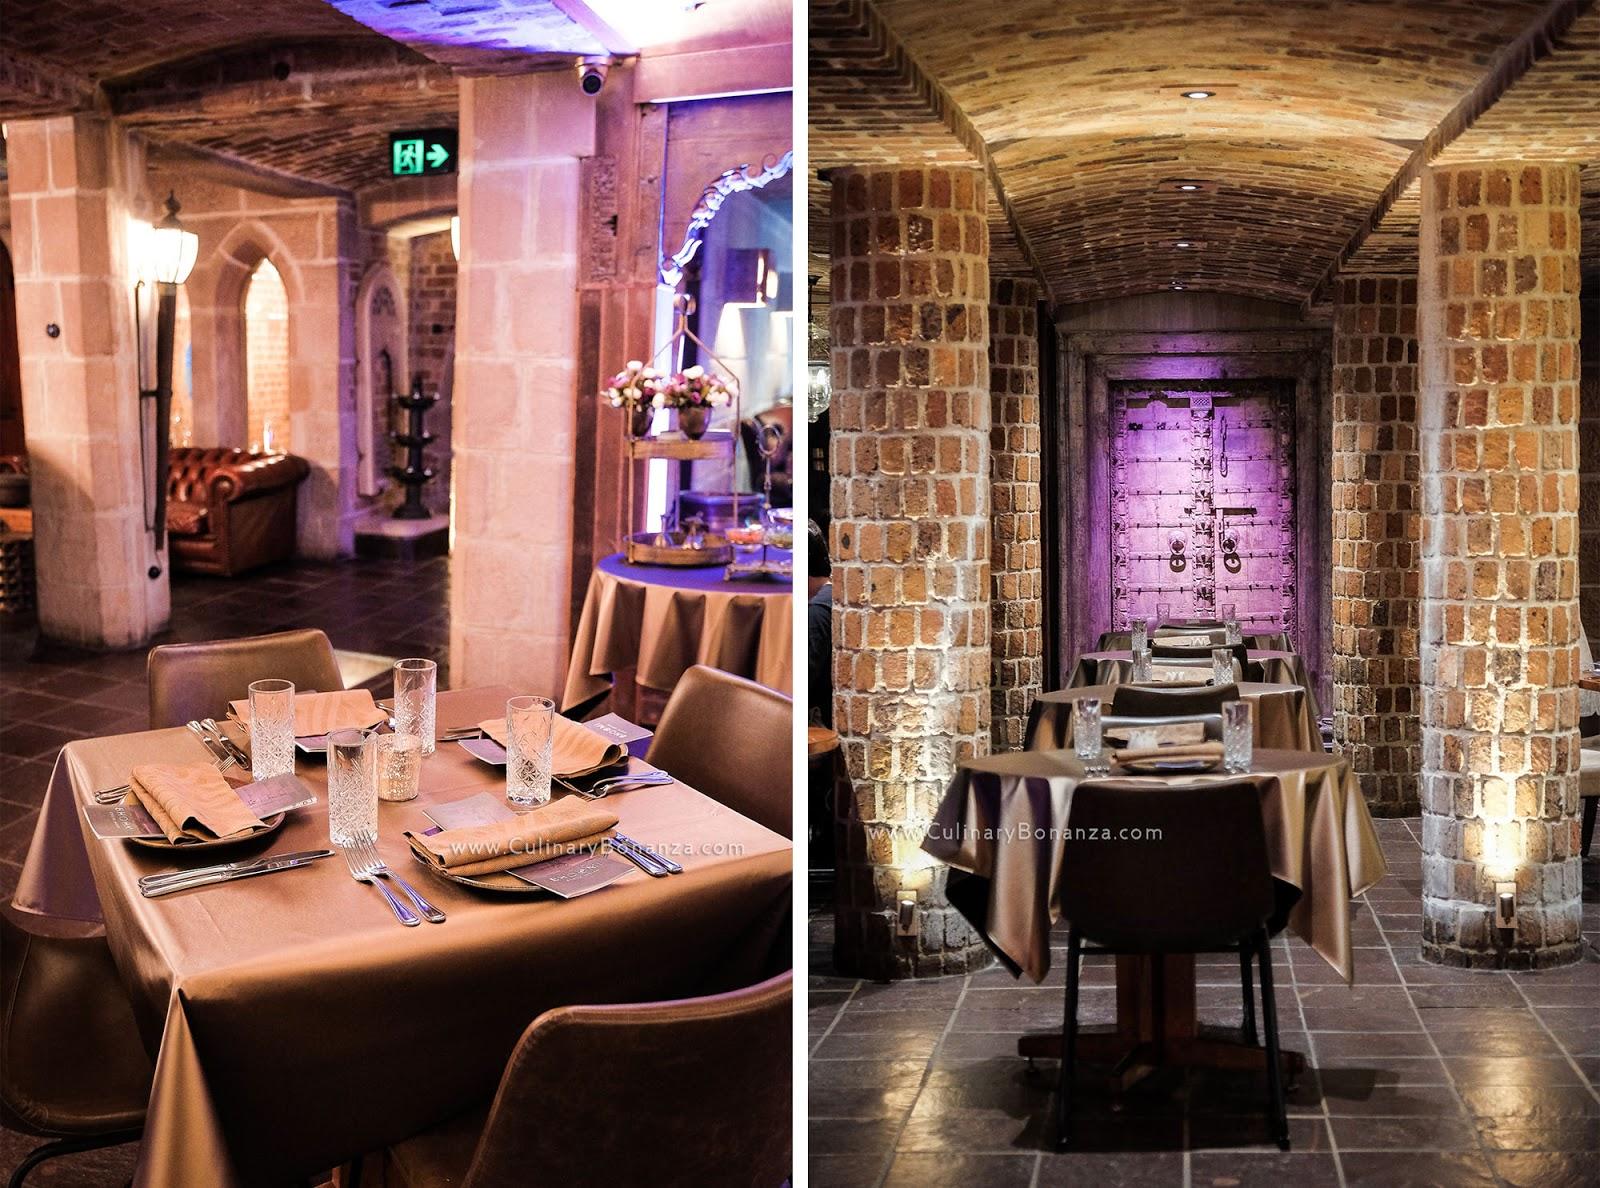 Bhoomi Restaurant and Cocktail Lounge Glebe Sydney (www.culinarybonanza.com)-12